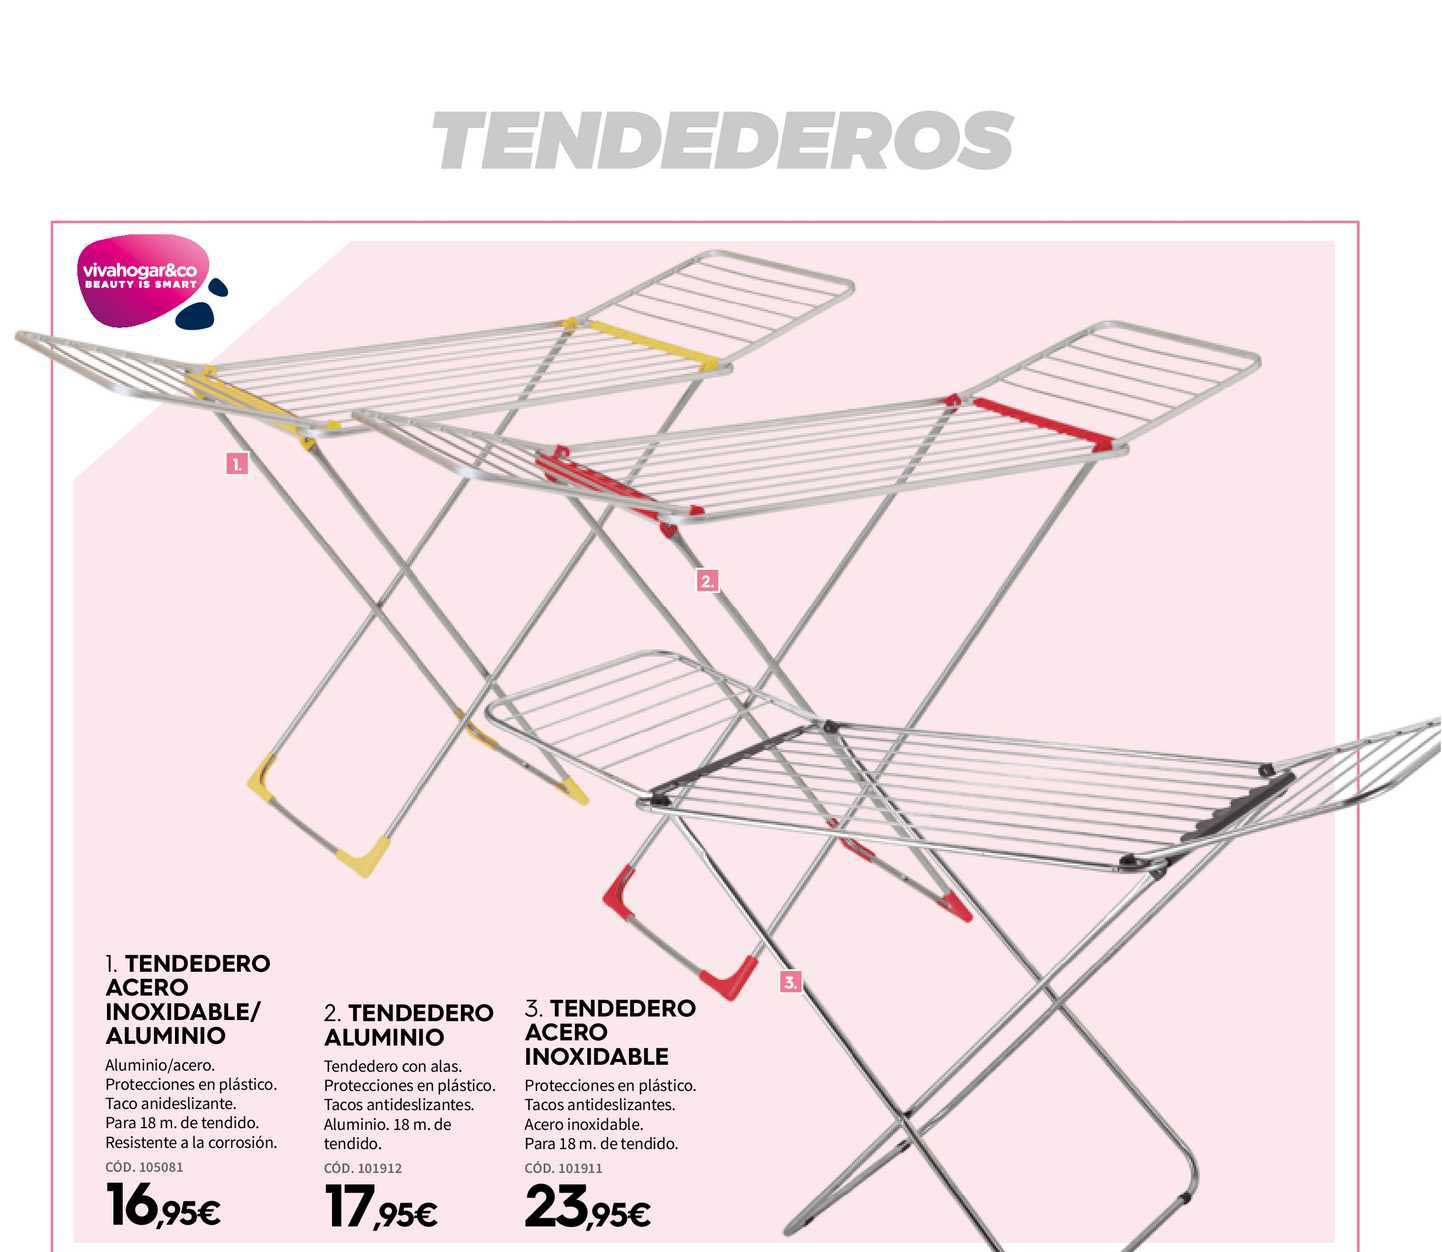 Ferrokey Tendedero Acero Inoxidable⁄aluminio, Tendedero Aluminio, Tendedero Acero Inoxidable